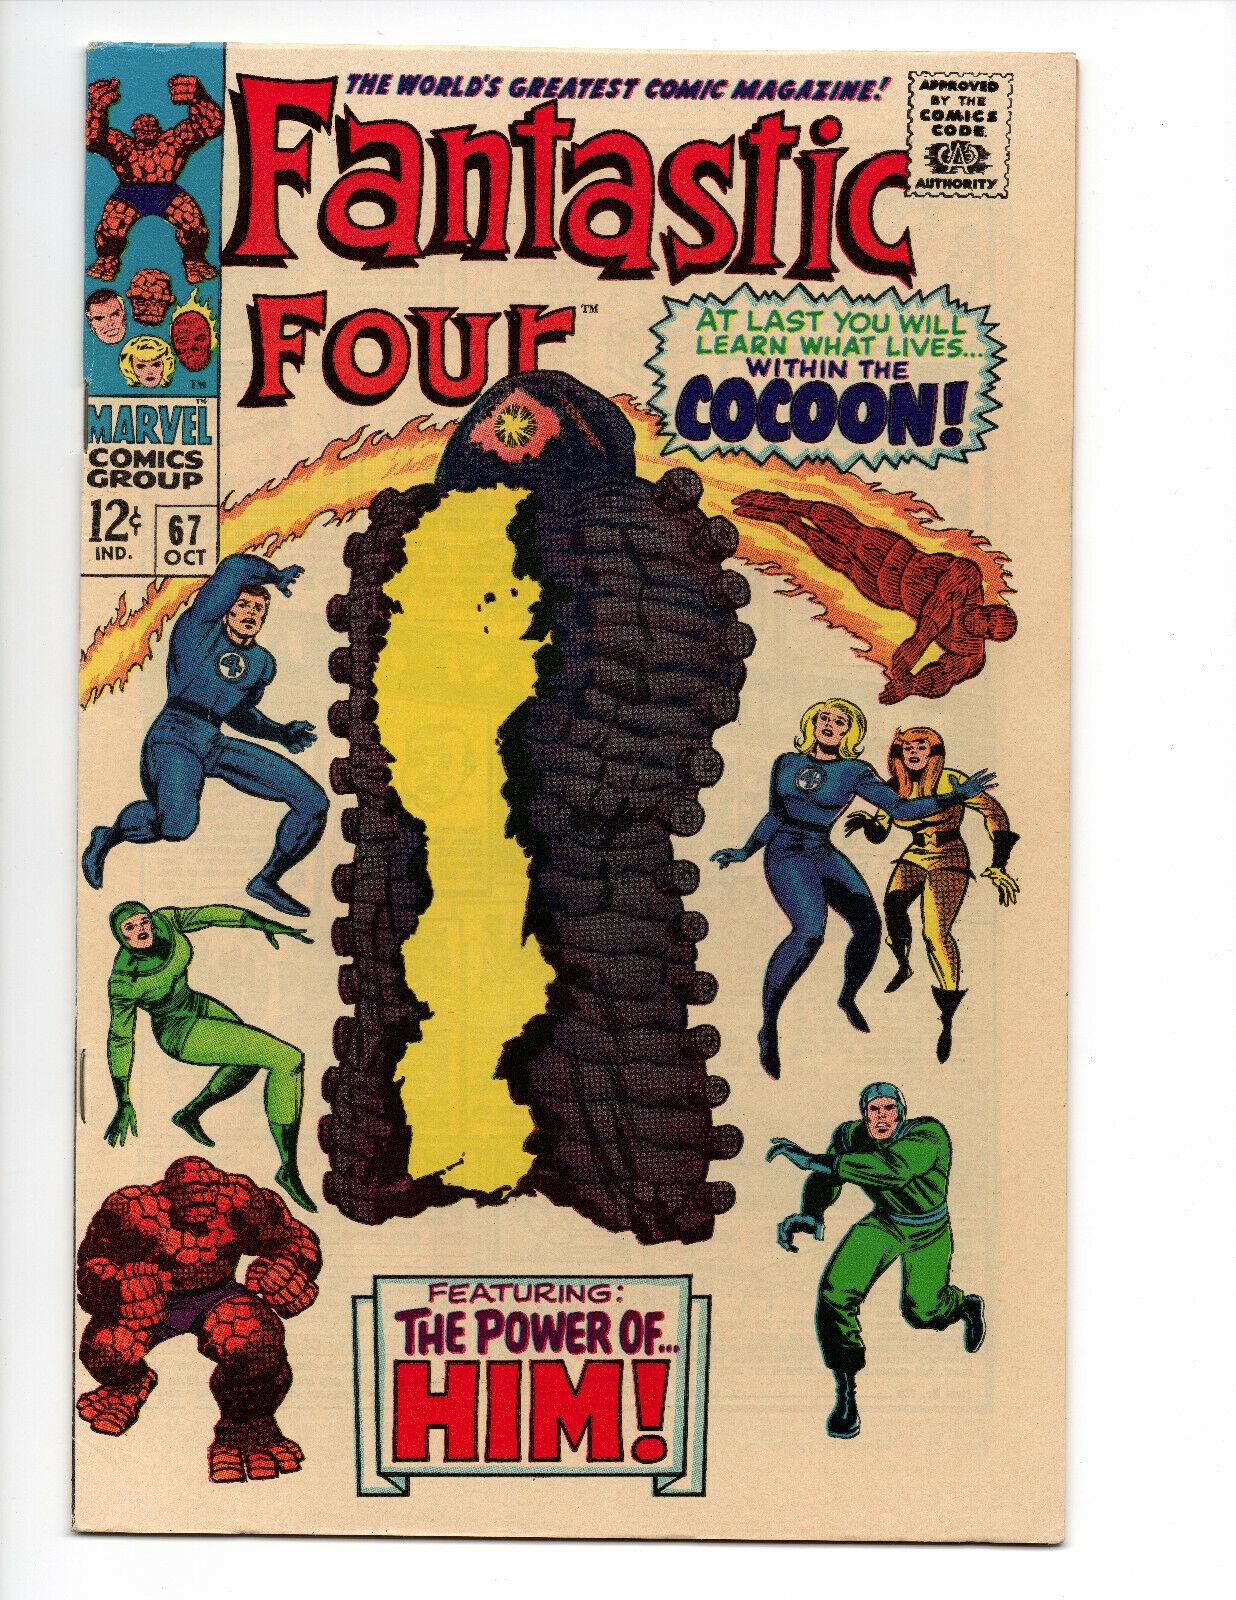 Fantastic Four #67 (1967 Marvel Comics)  - Origin/first app. of HIM (Warlock)